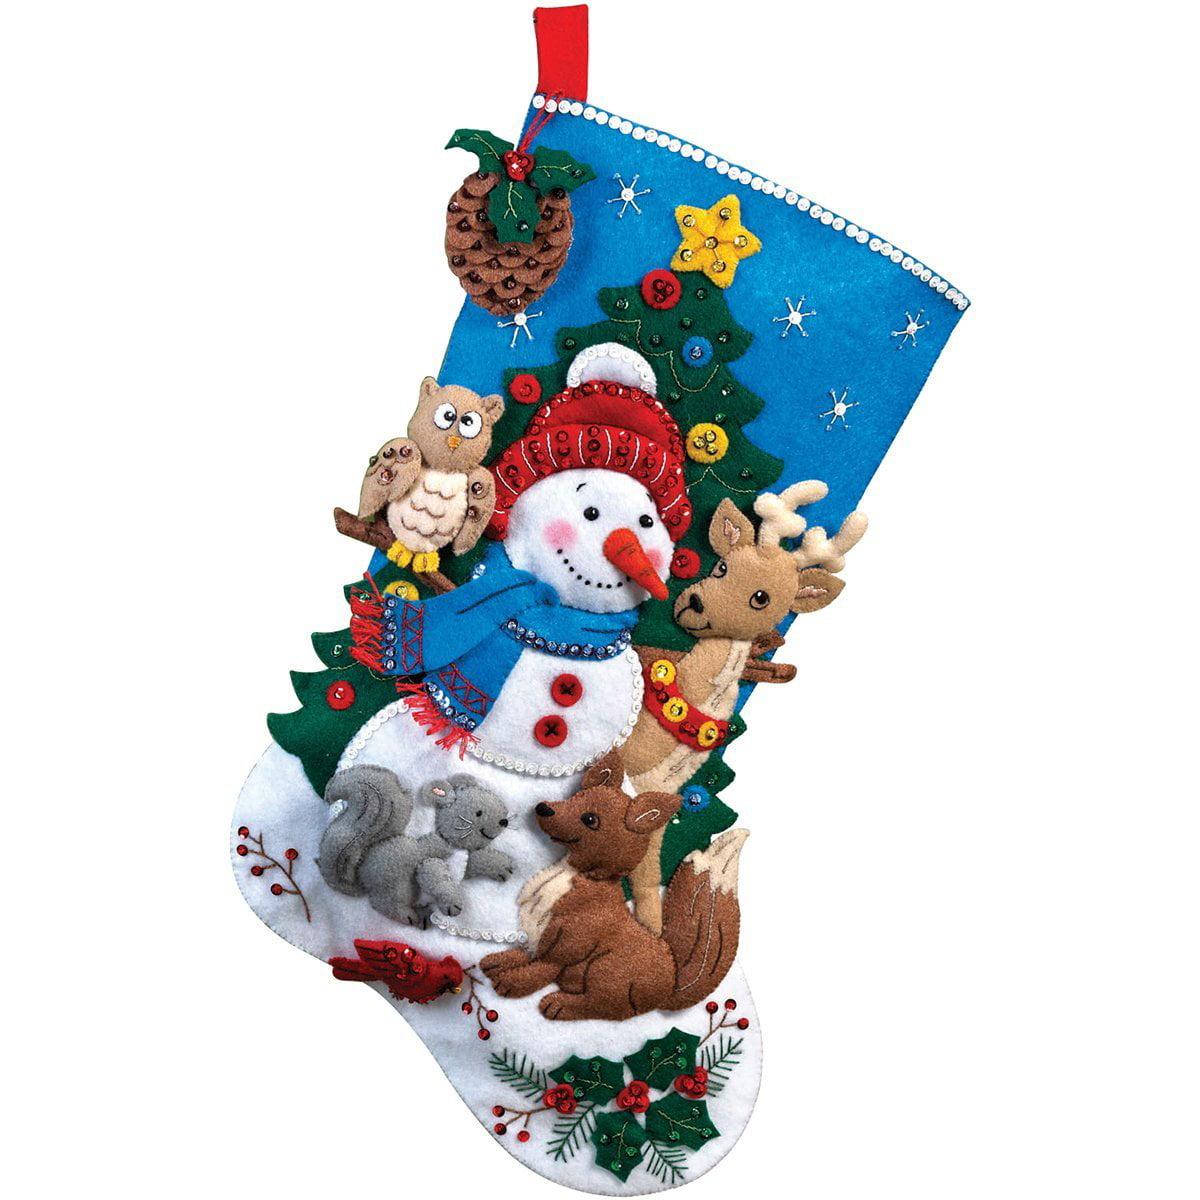 Bucilla Christmas Stocking Kits.18 Inch Christmas Stocking Felt Applique Kit 86505 Woodland Snowman Bucilla Felt Applique Stocking By Bucilla